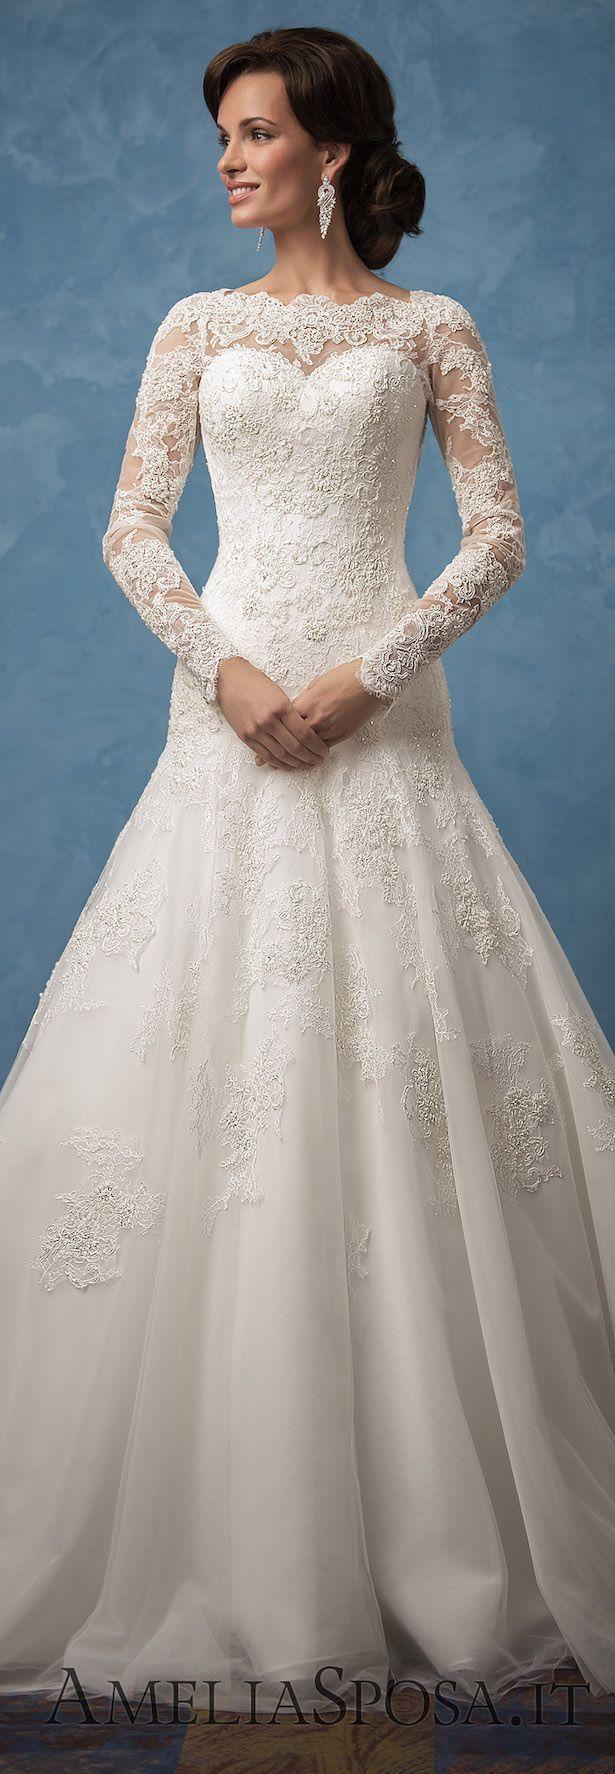 Wedding dresses illustration description wedding dress by amelia